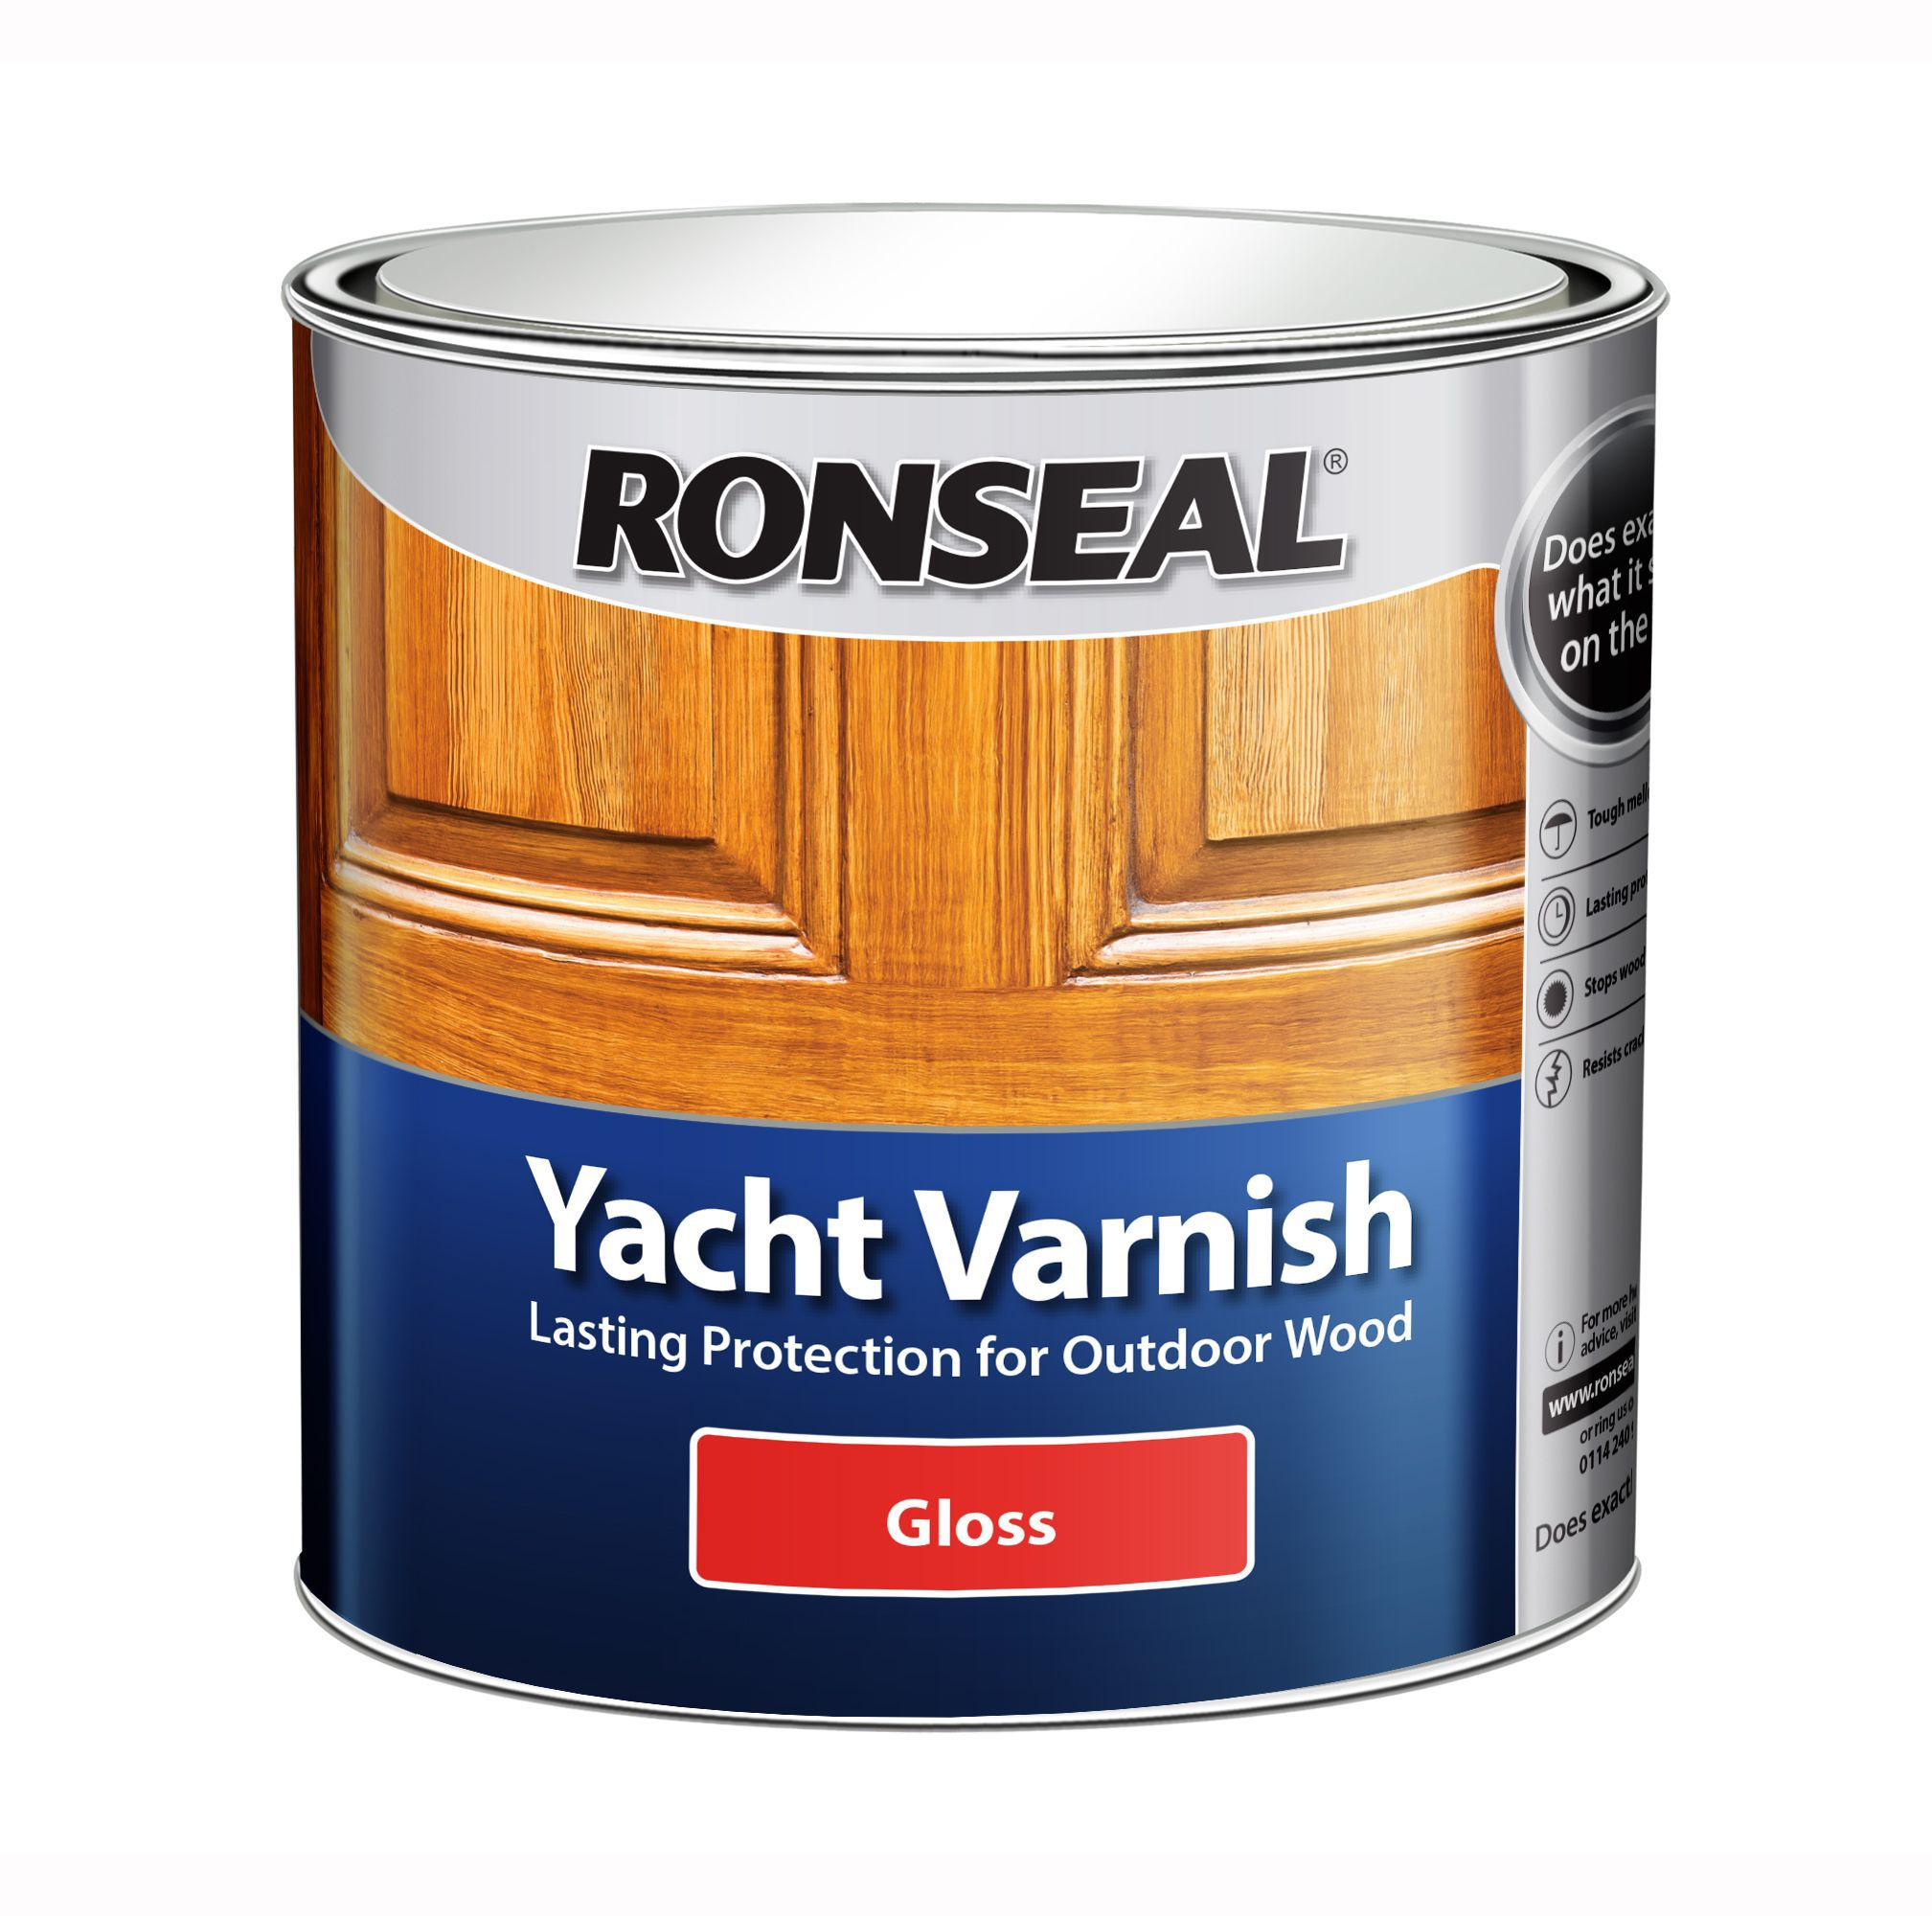 Ronseal Yacht Varnish Gloss 1L